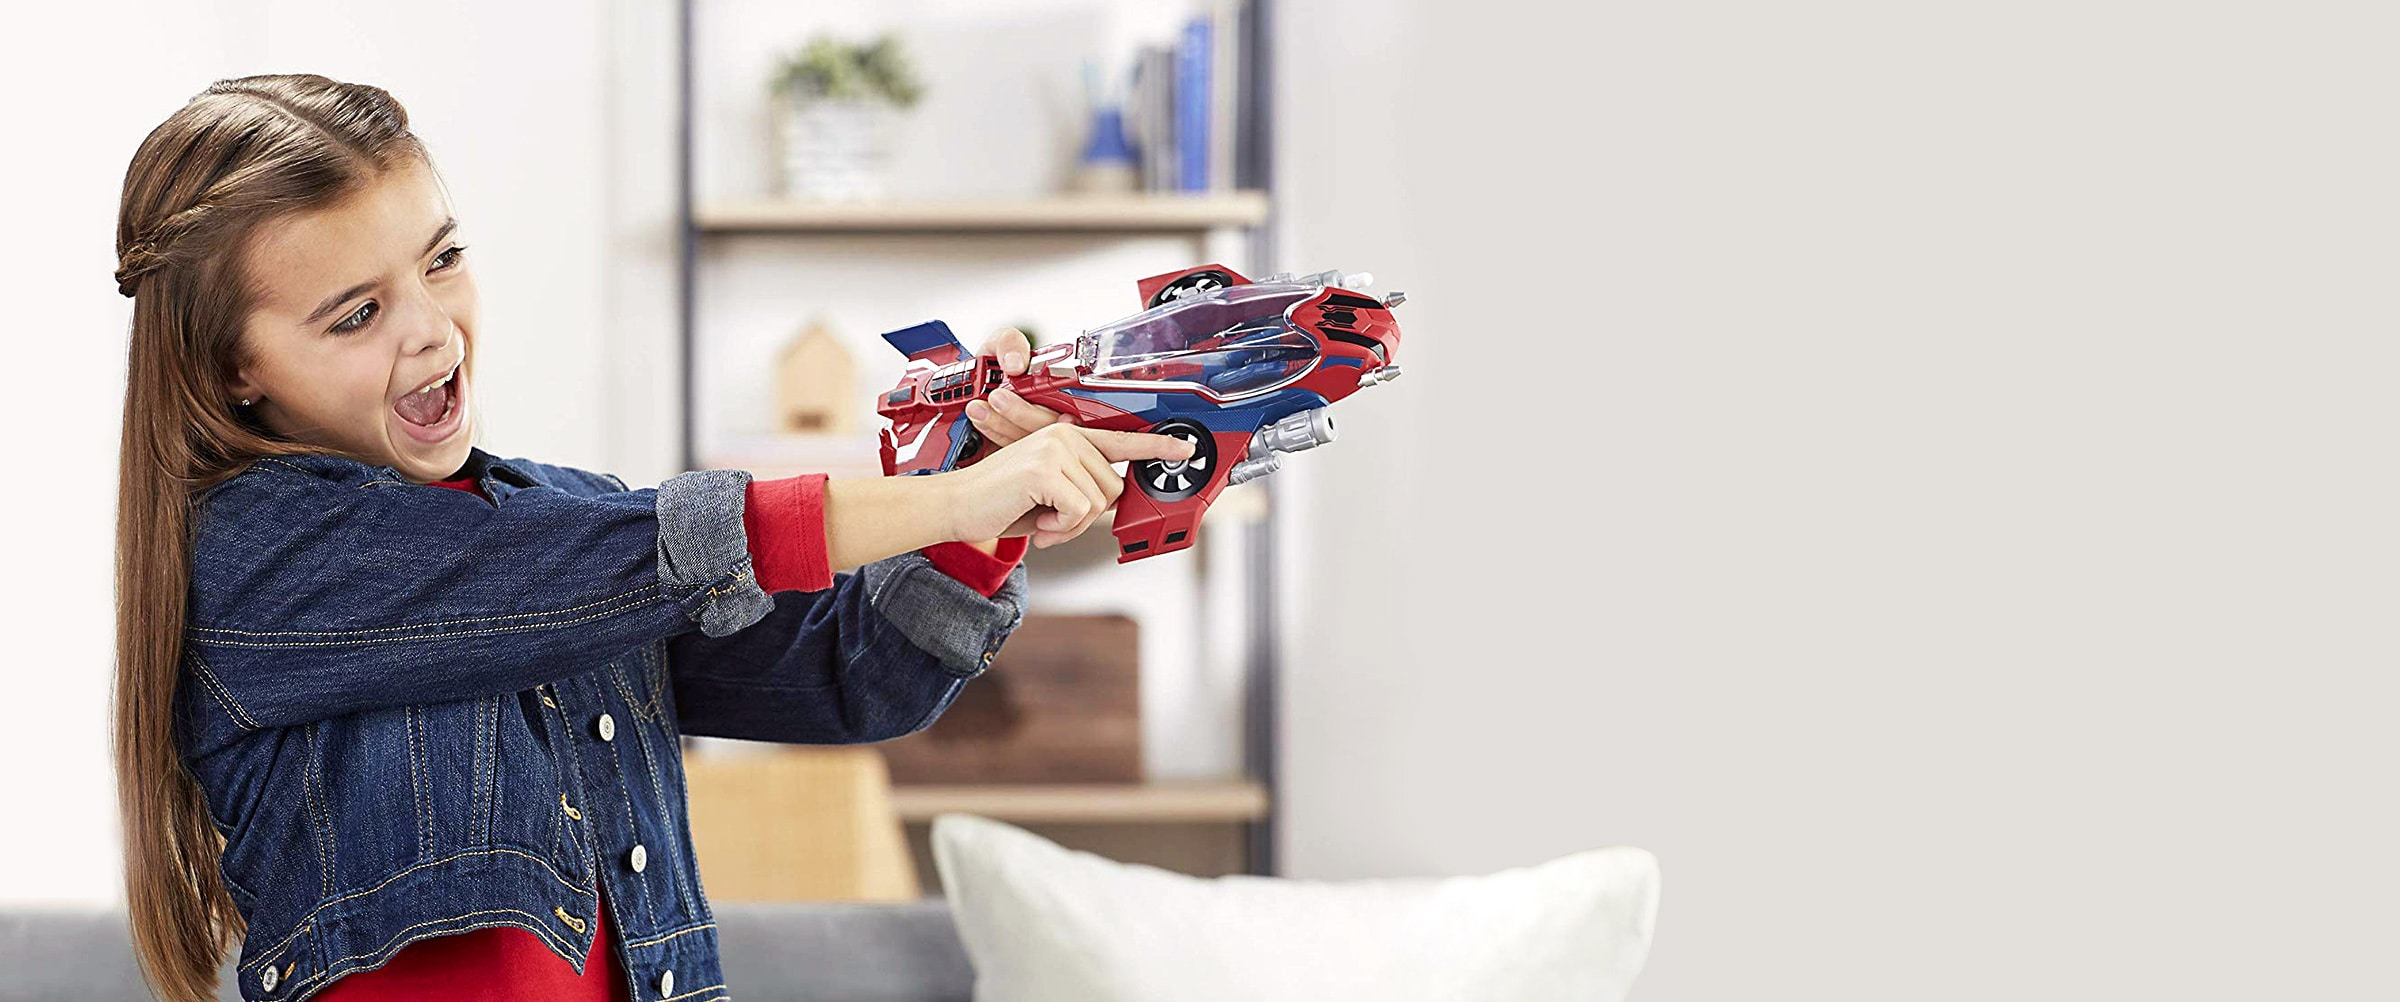 Shop | Shop Marvel | Hero | Spiderman Toys Big W